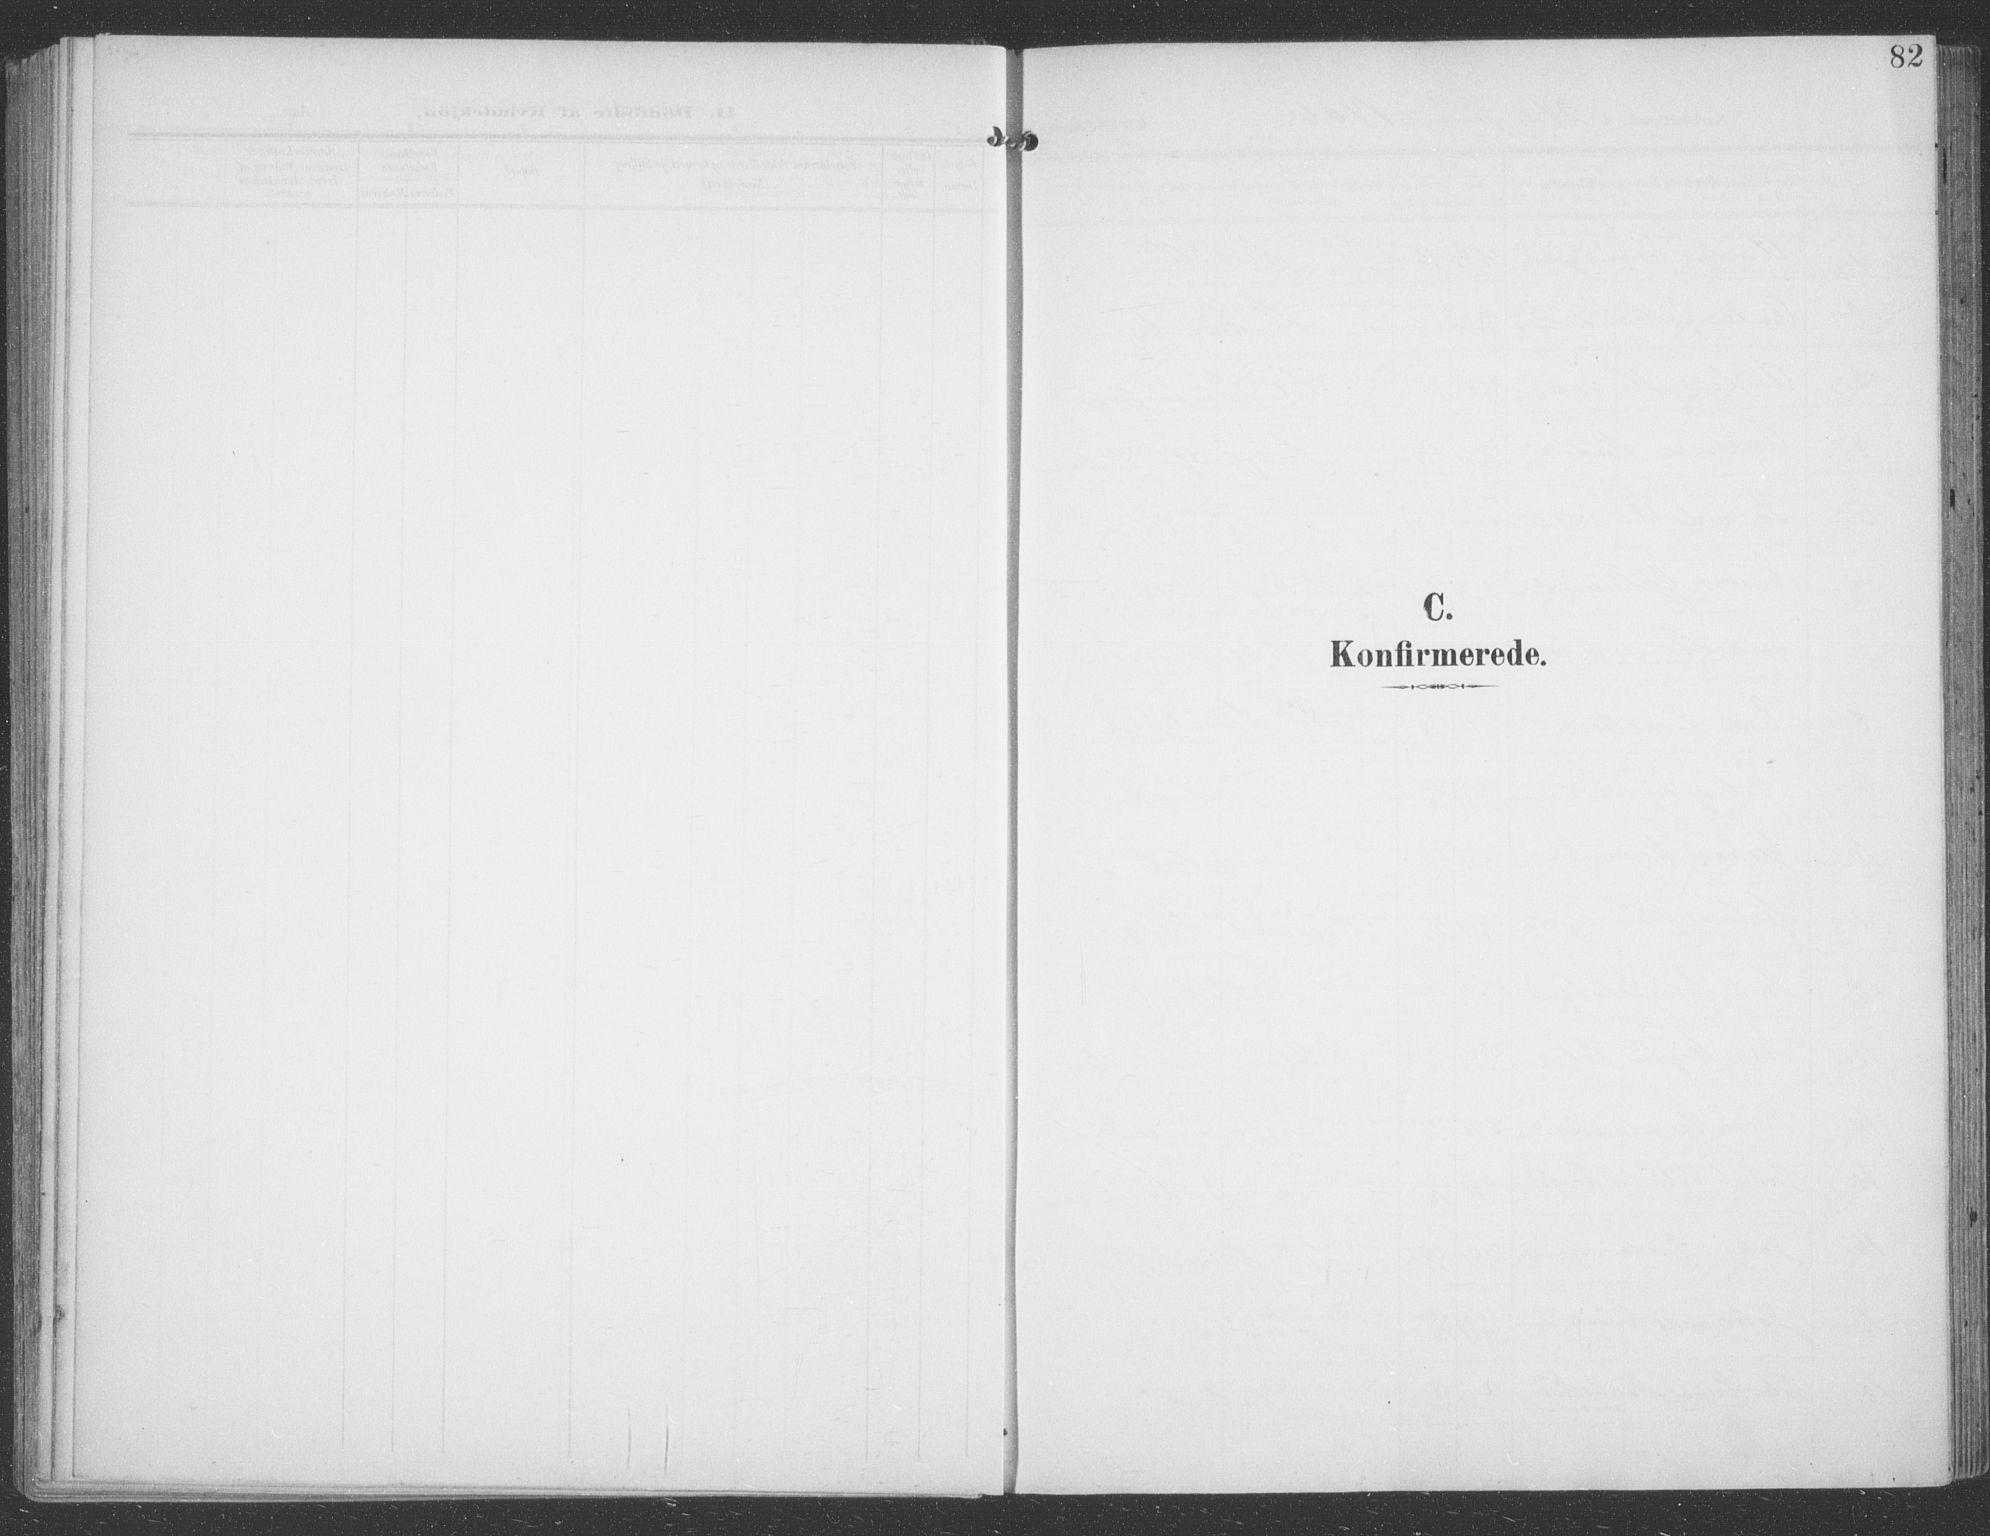 SATØ, Talvik sokneprestkontor, H/Ha/L0017kirke: Ministerialbok nr. 17, 1906-1915, s. 82